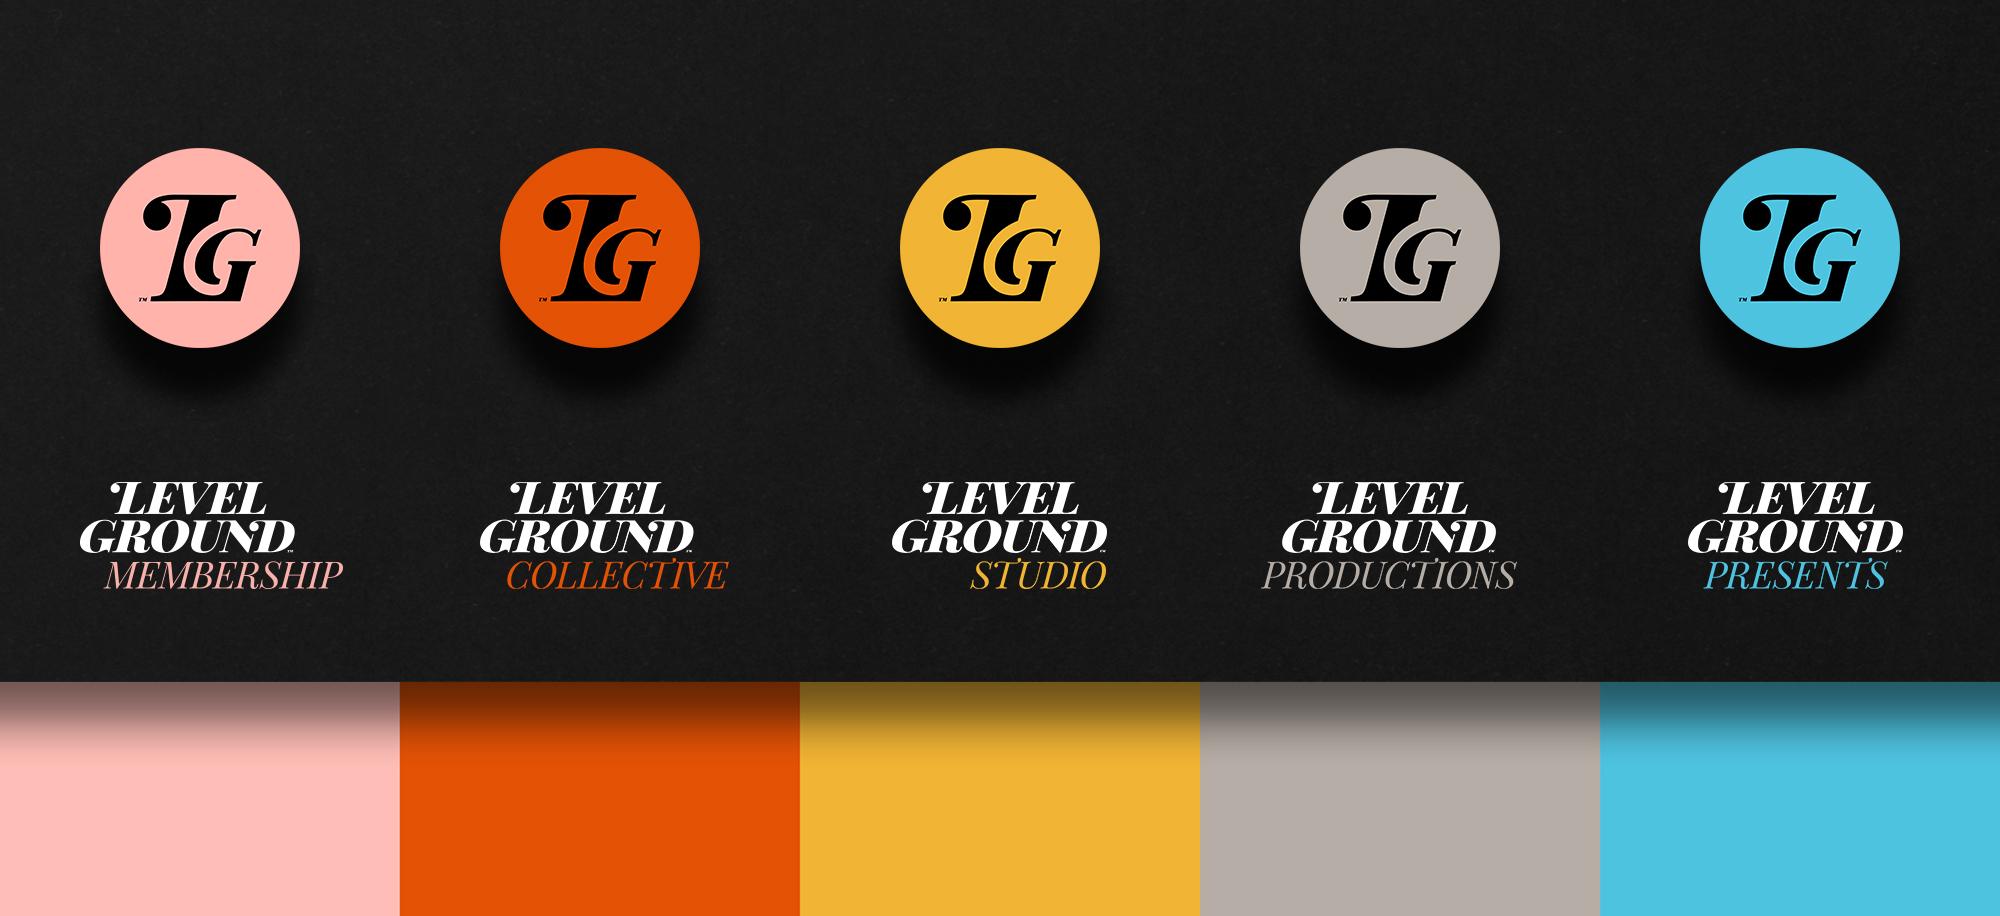 Level Ground Icon Designs